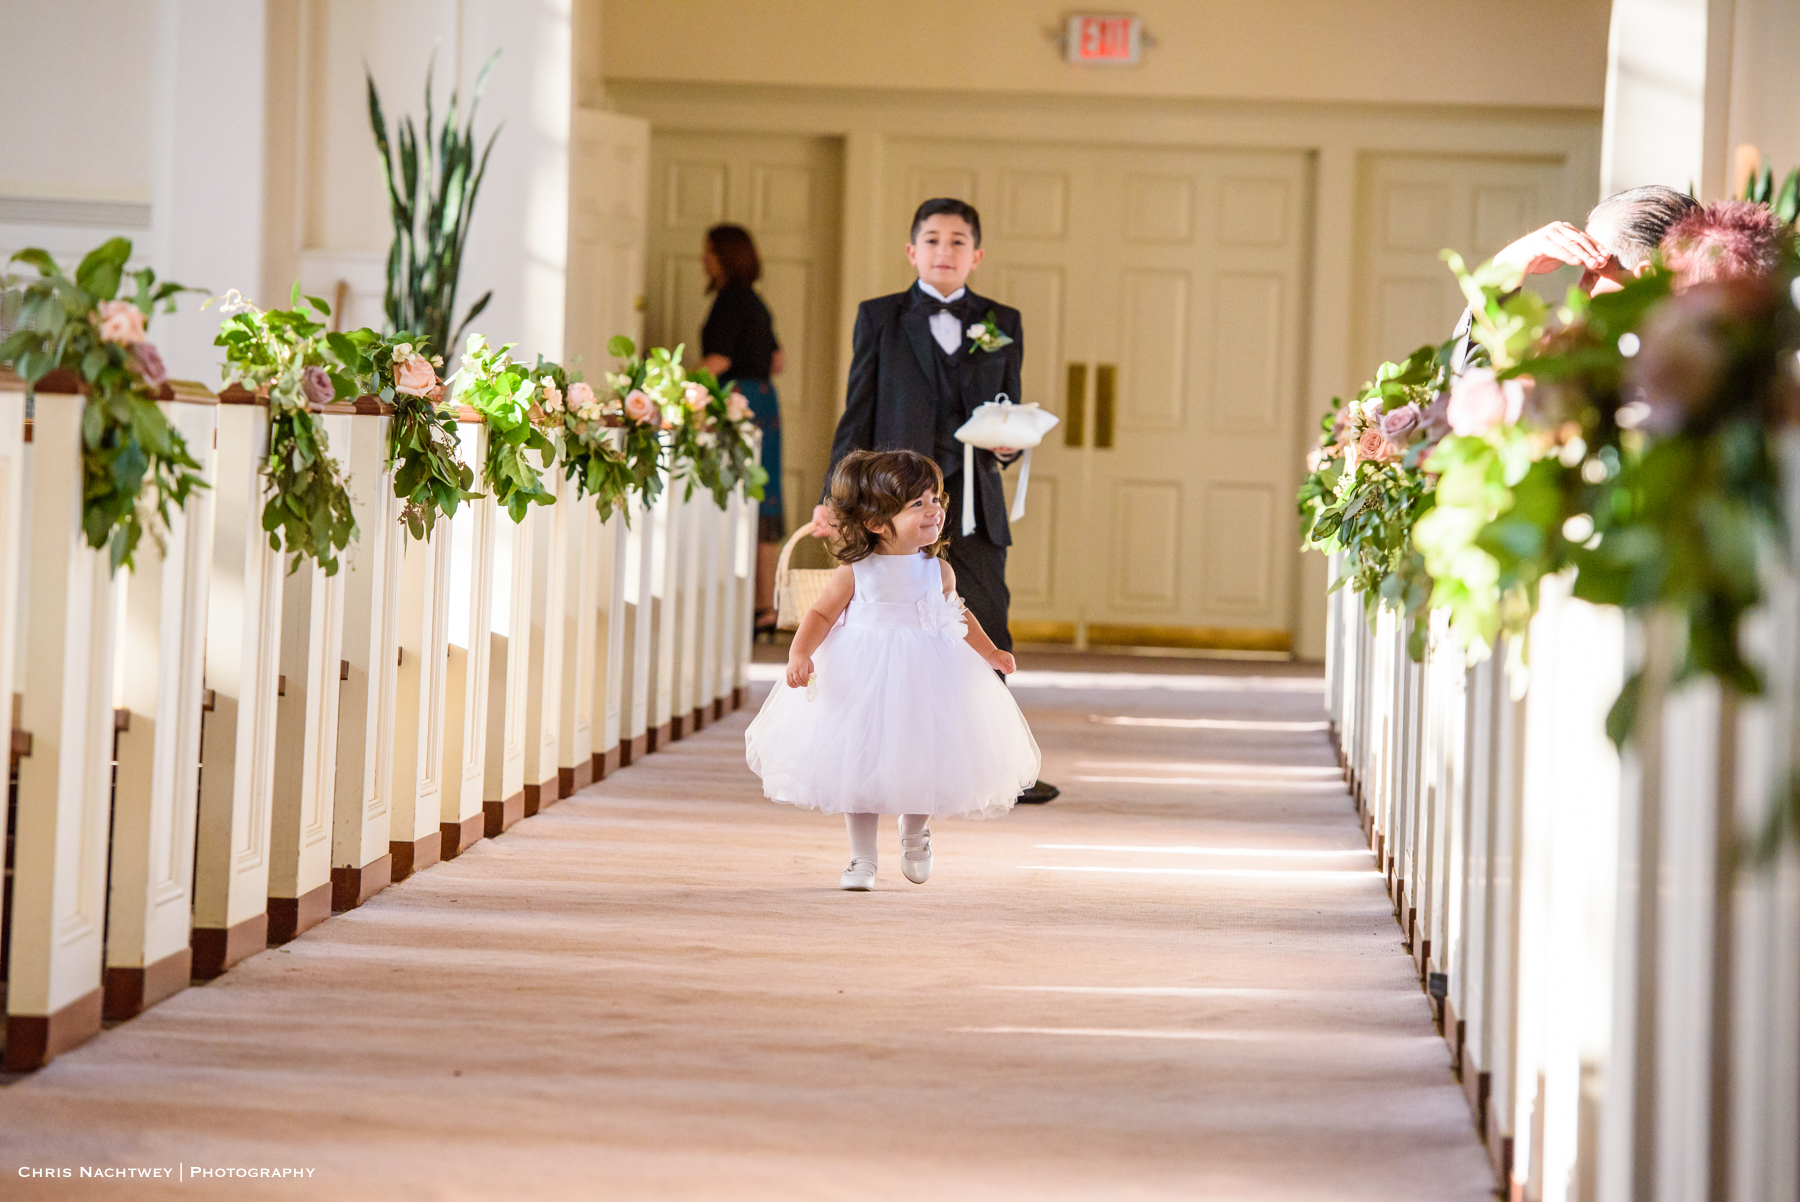 winter-branford-house-wedding-photos-groton-ct-chris-nachtwey-photography-2019-10.jpg